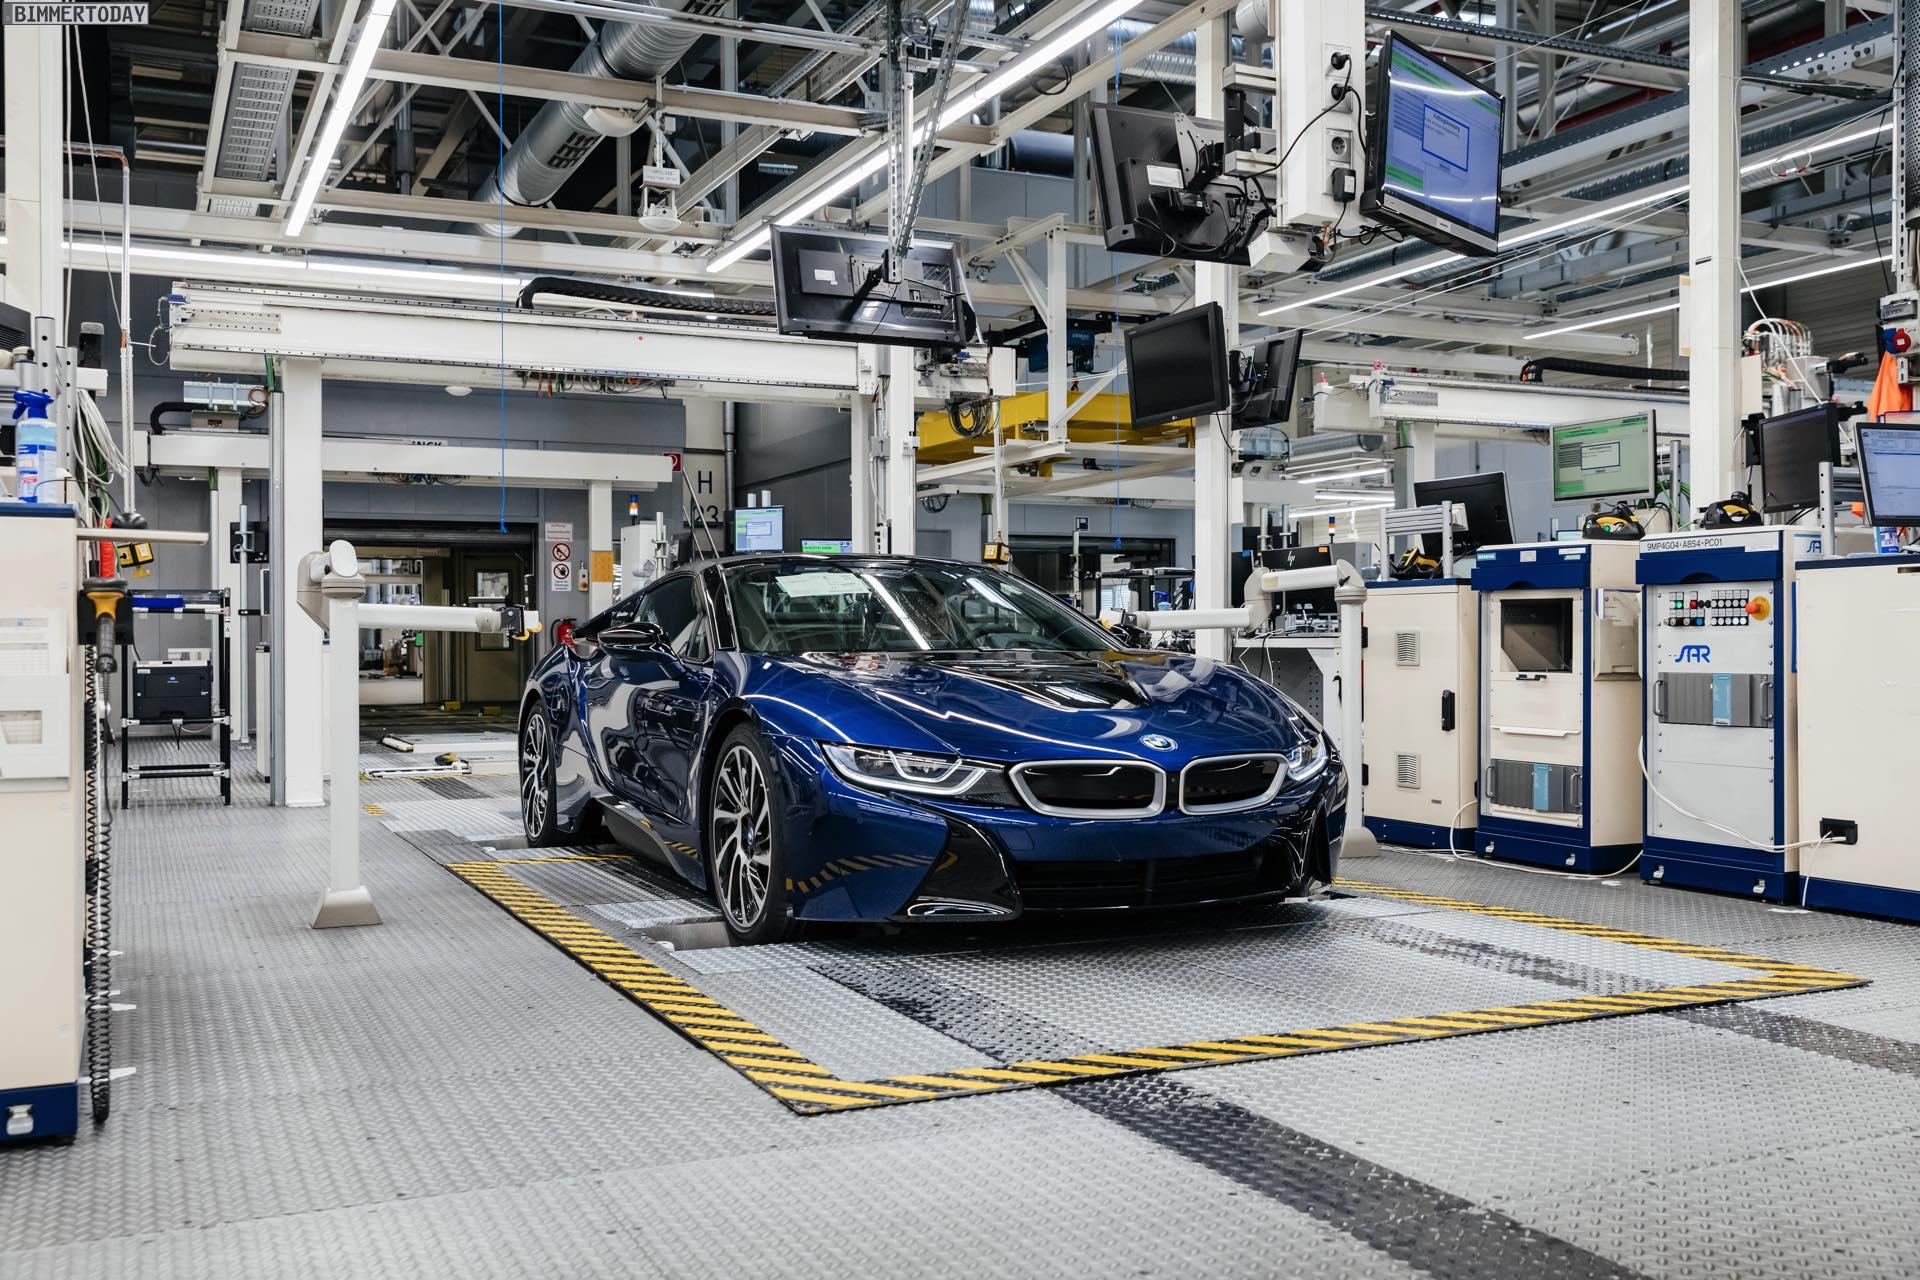 2013 - [BMW] i8 [i12] - Page 23 BMW-i8-Finale-Werk-Leipzig-Individual-Roadster-Produktion-62